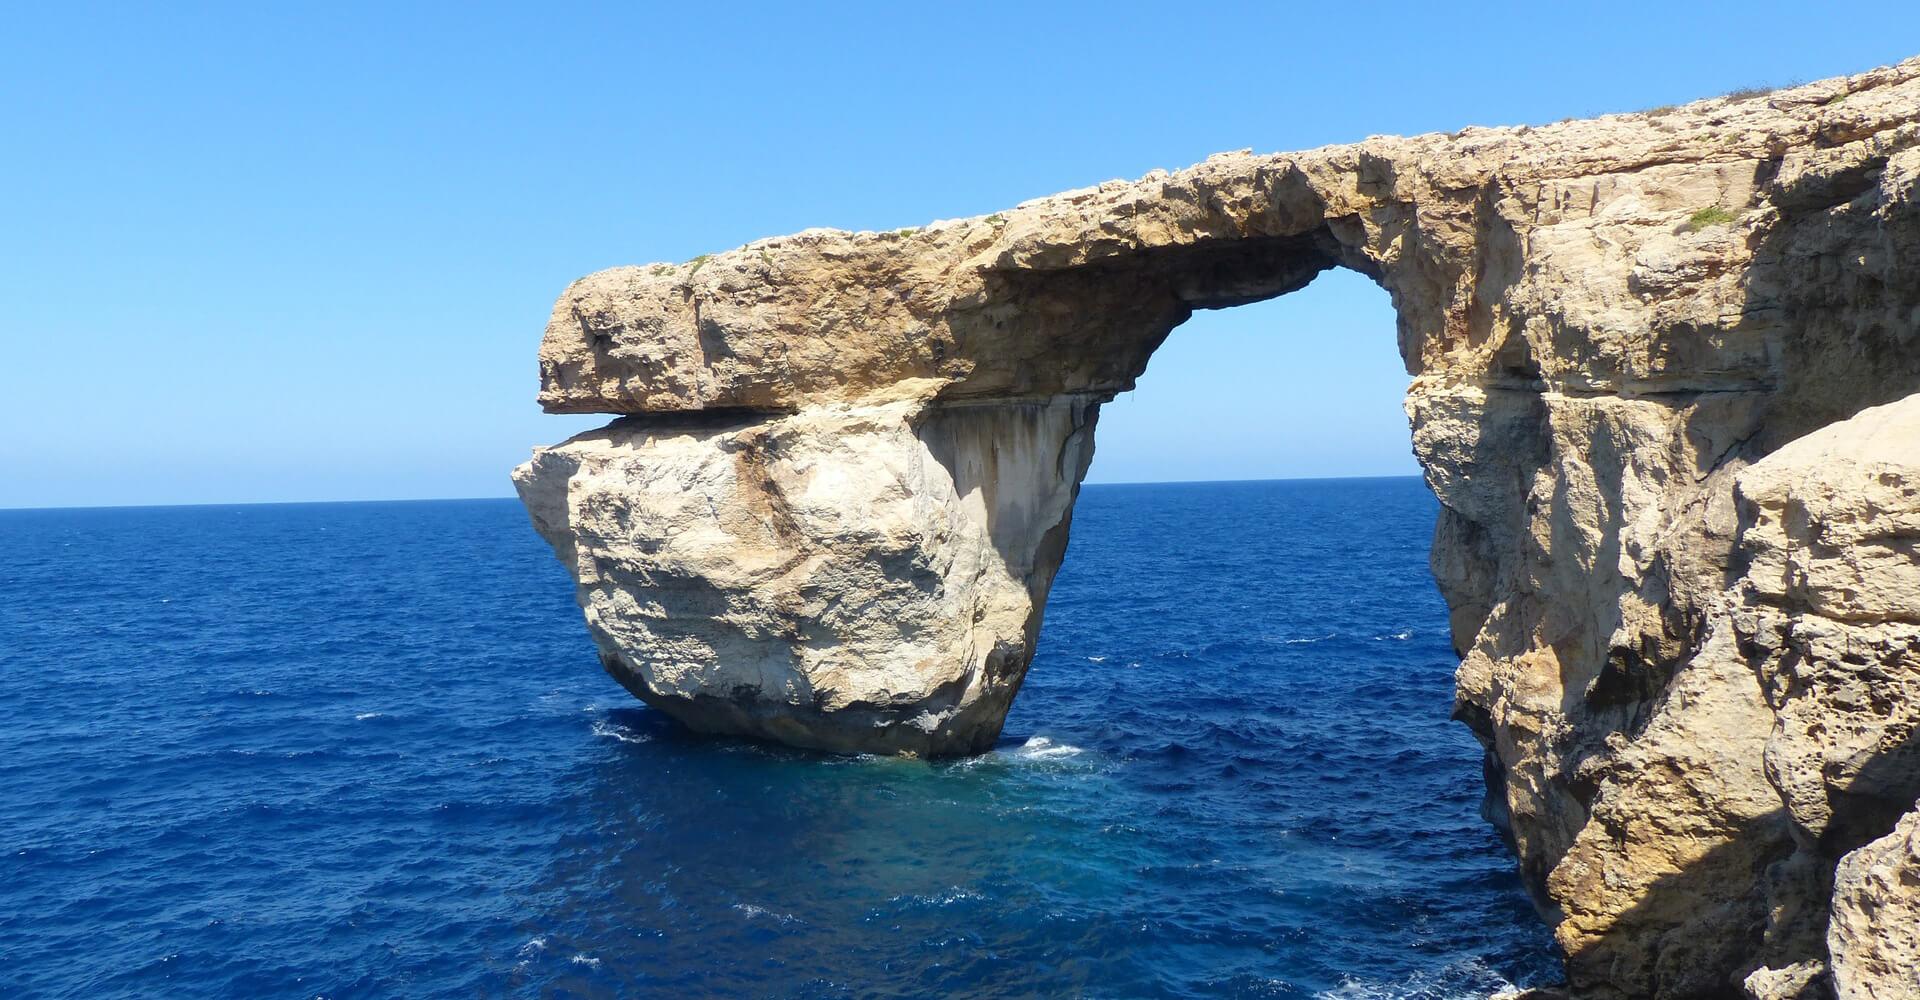 sea-coast-nature-rock-ocean-malta